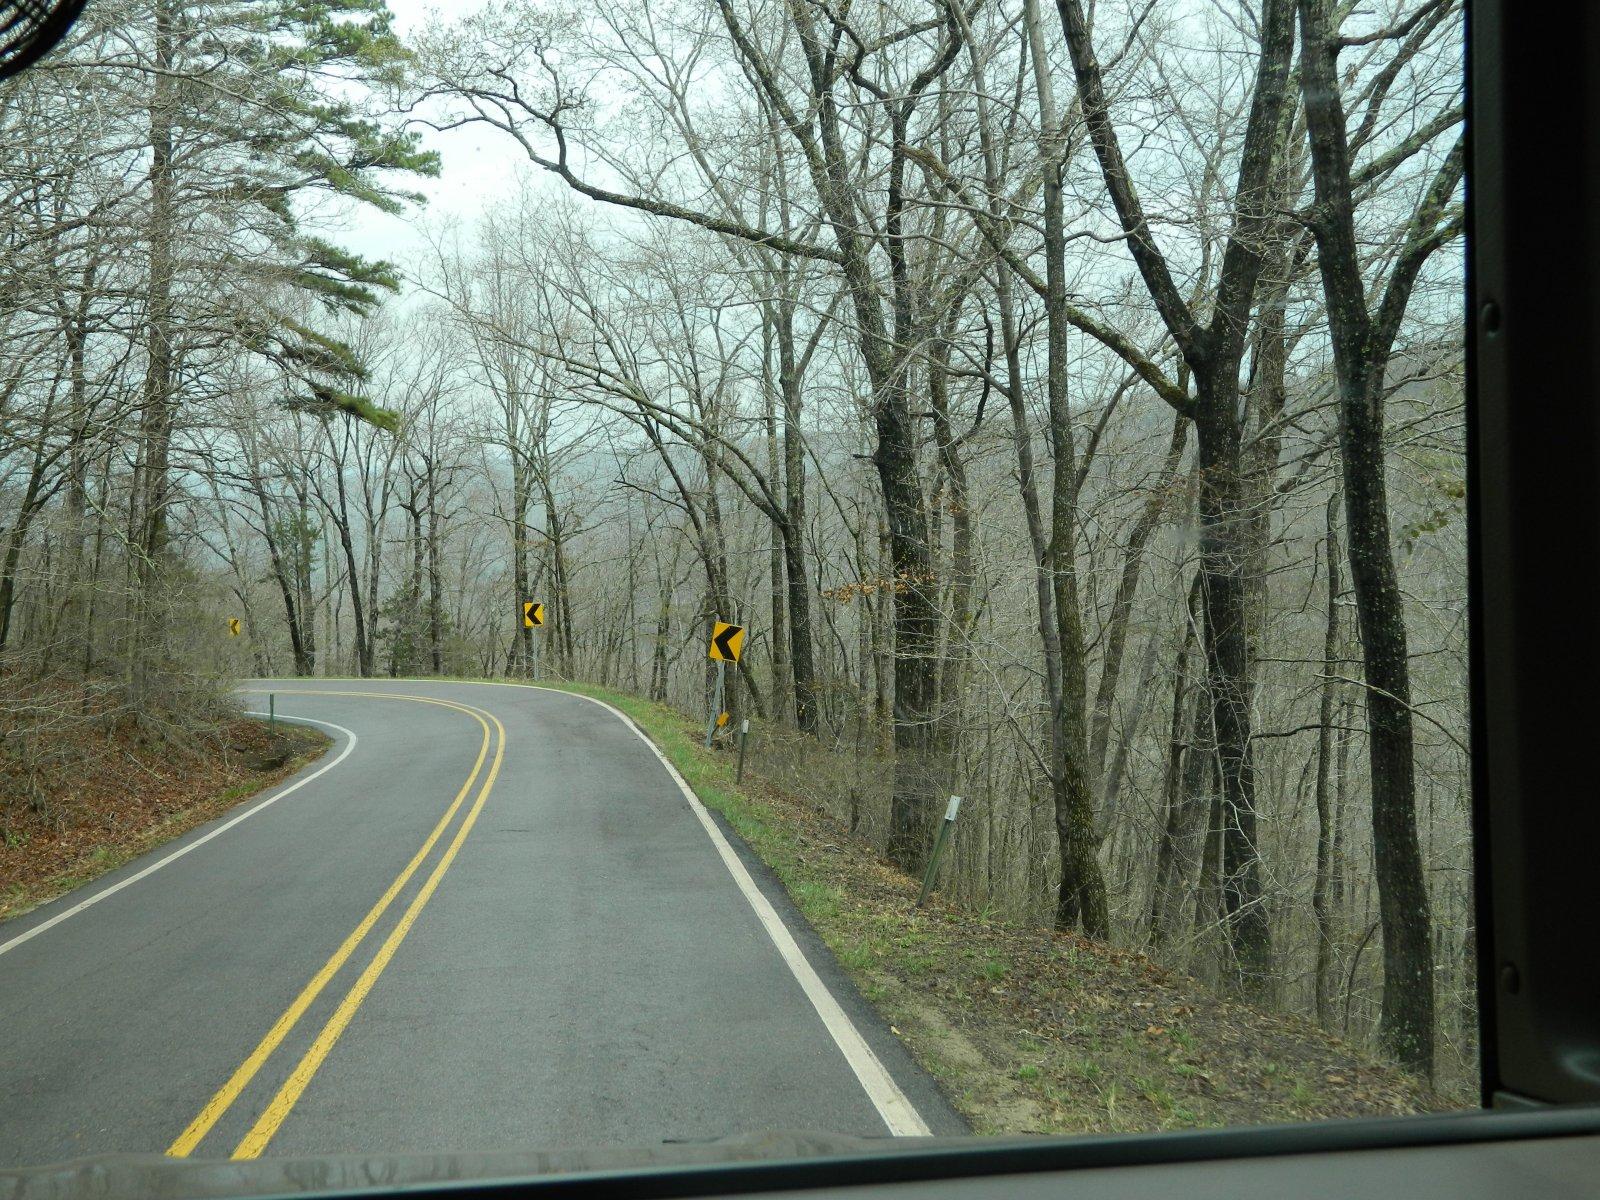 Click image for larger version  Name:Arkansas Trip 2014 290.jpg Views:113 Size:583.7 KB ID:88030